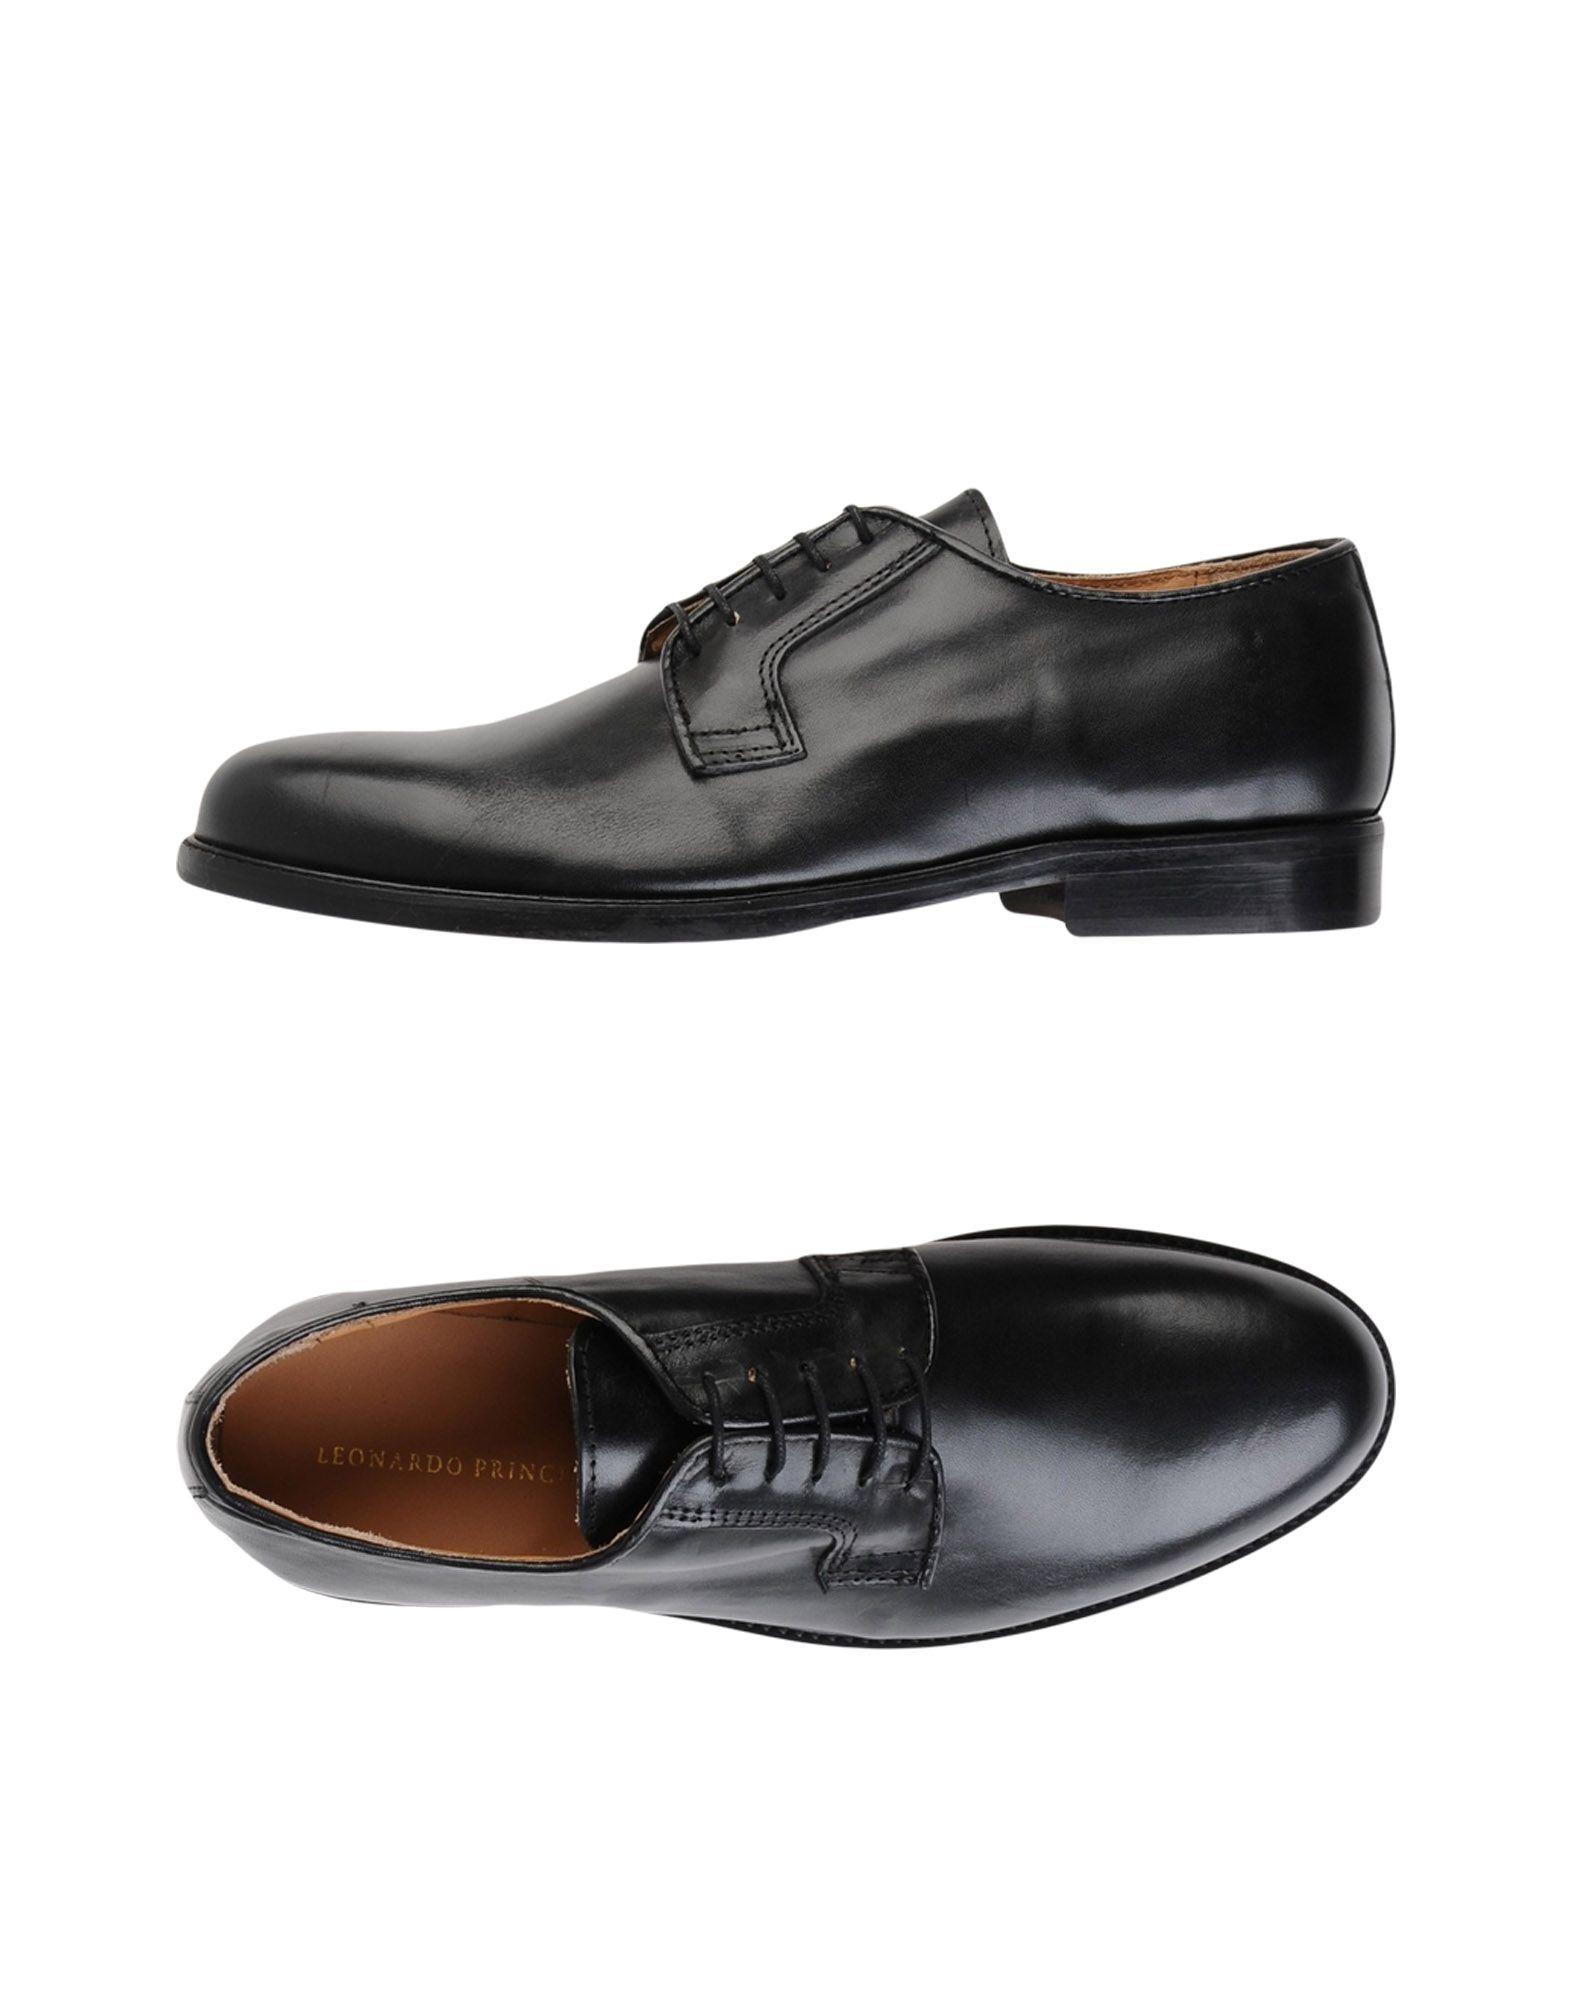 ФОТО leonardo principi Обувь на шнурках